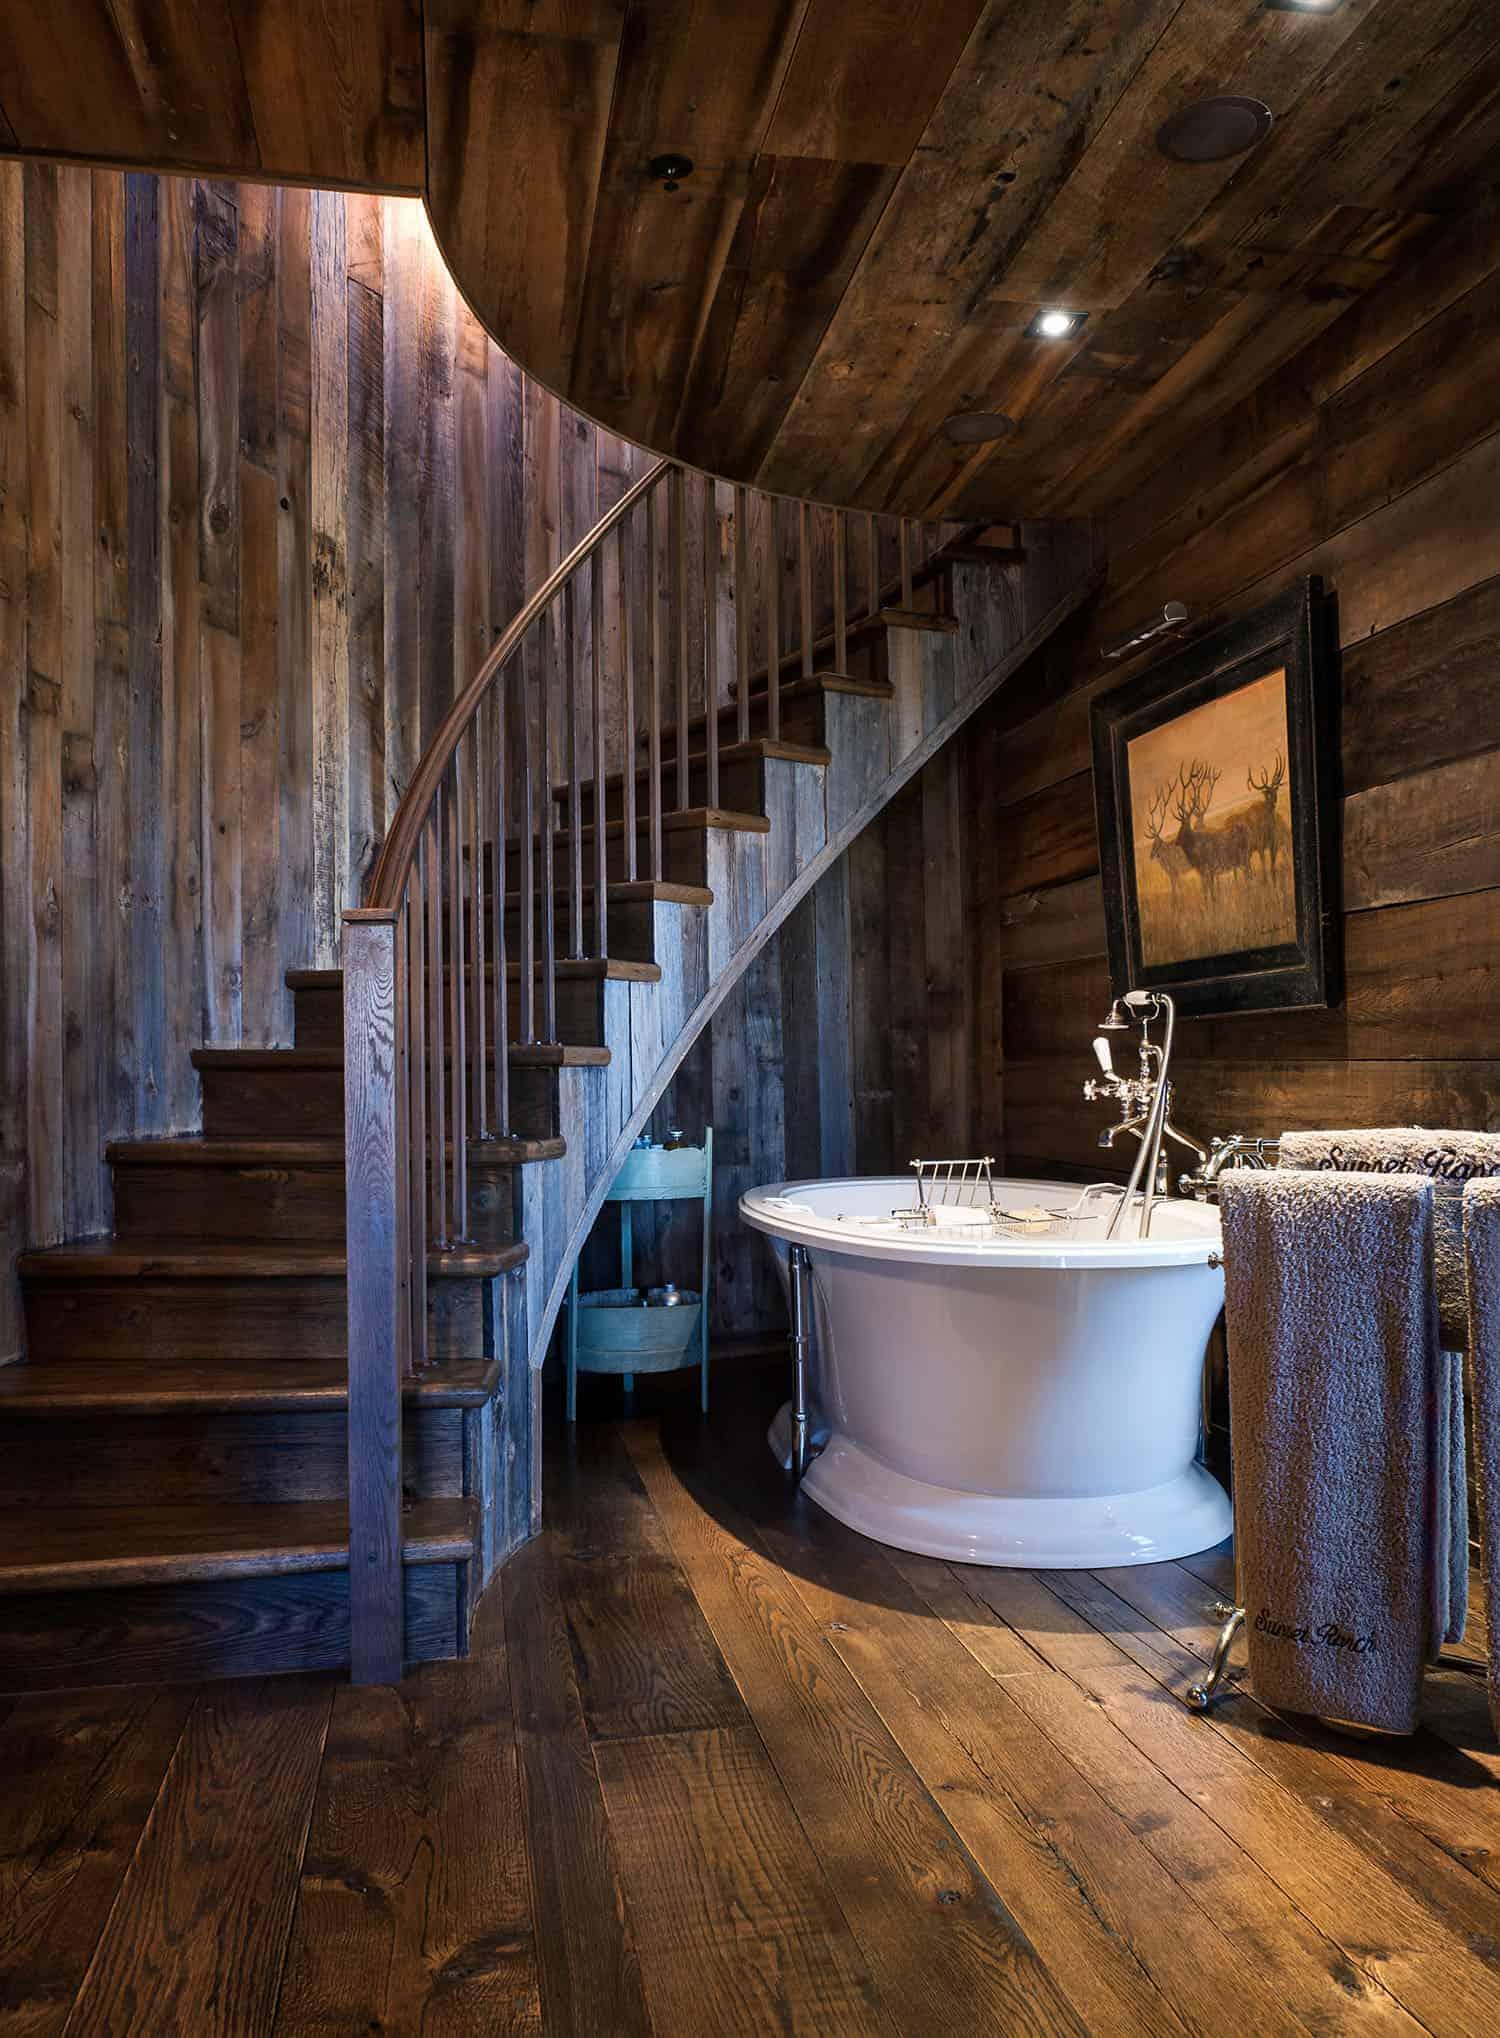 moderno-rustikalna-kupaonica u stilu ambara